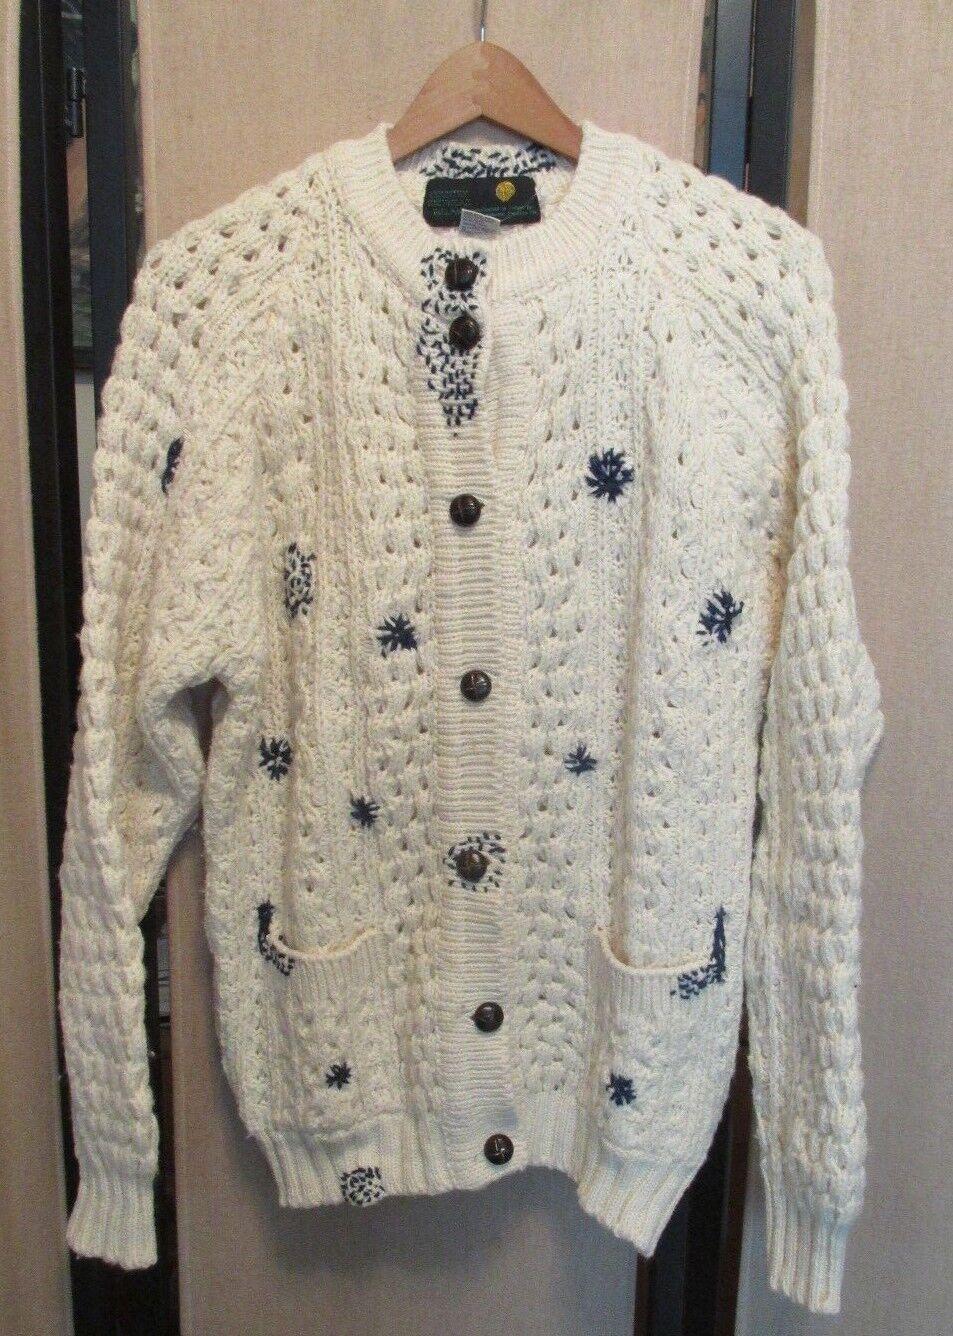 Country Knitwear Irish Wool Cardigan Sweater Cable Knit Fishermen